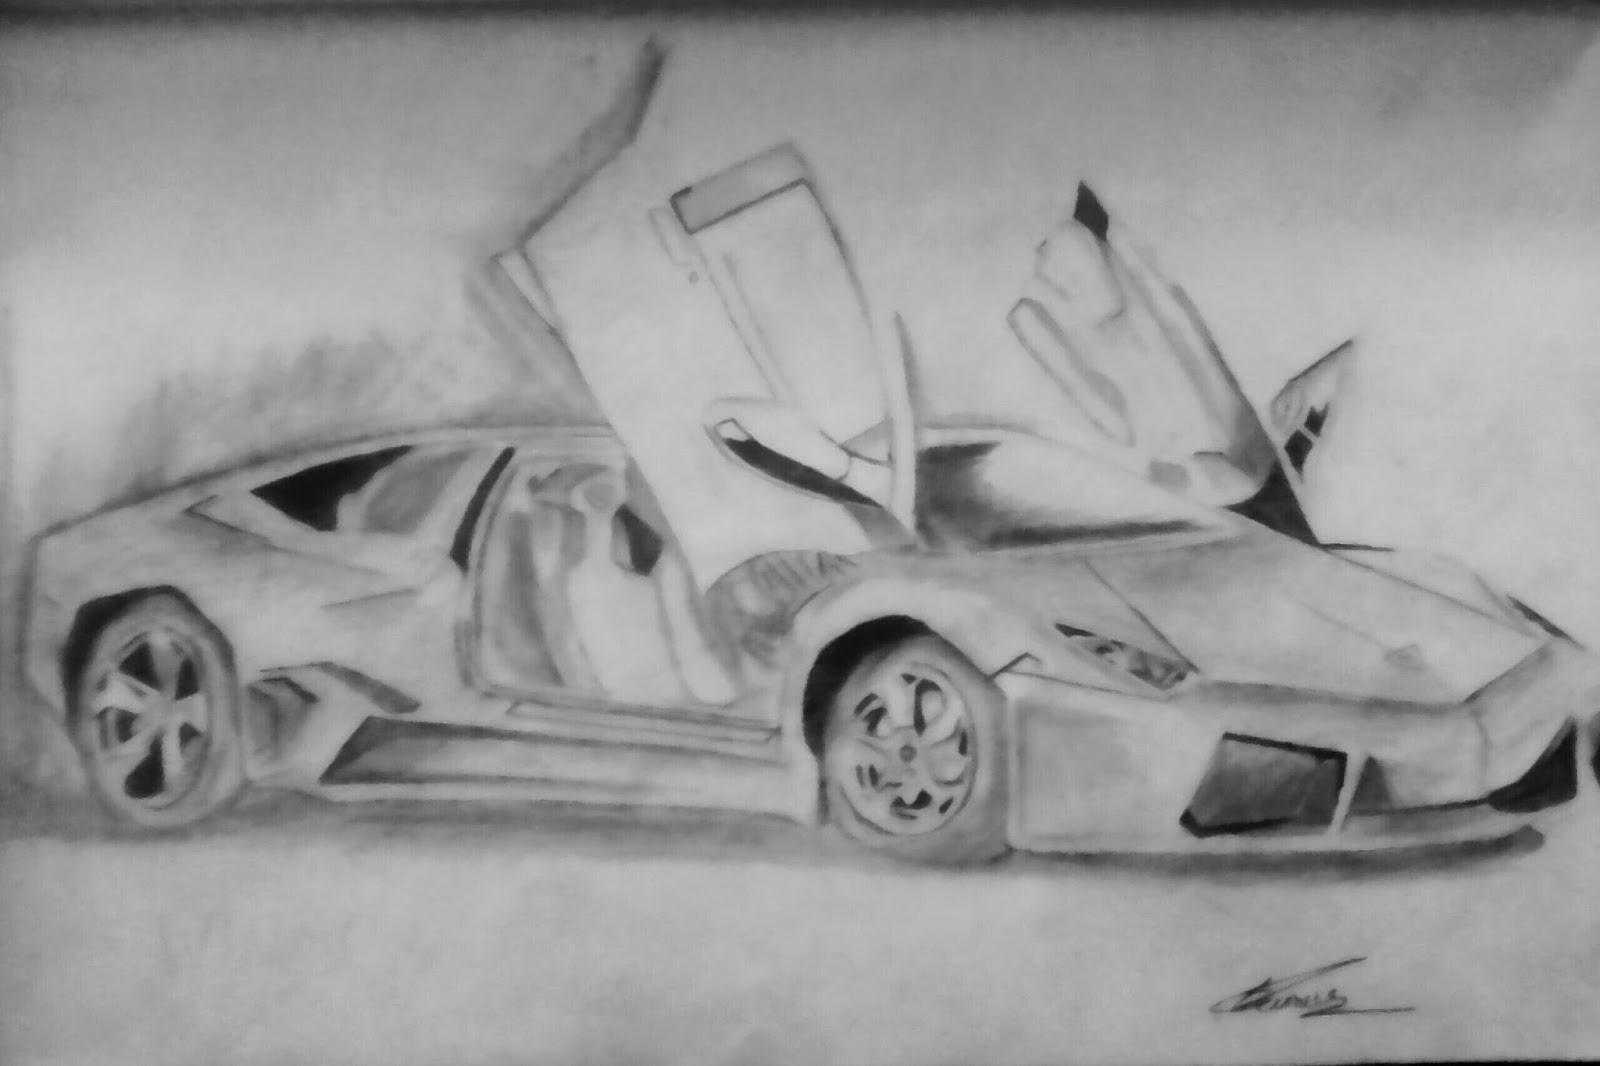 Sameer Pimplkar Drawing Lamborghini Sketch Pencil Drawing By Sameer